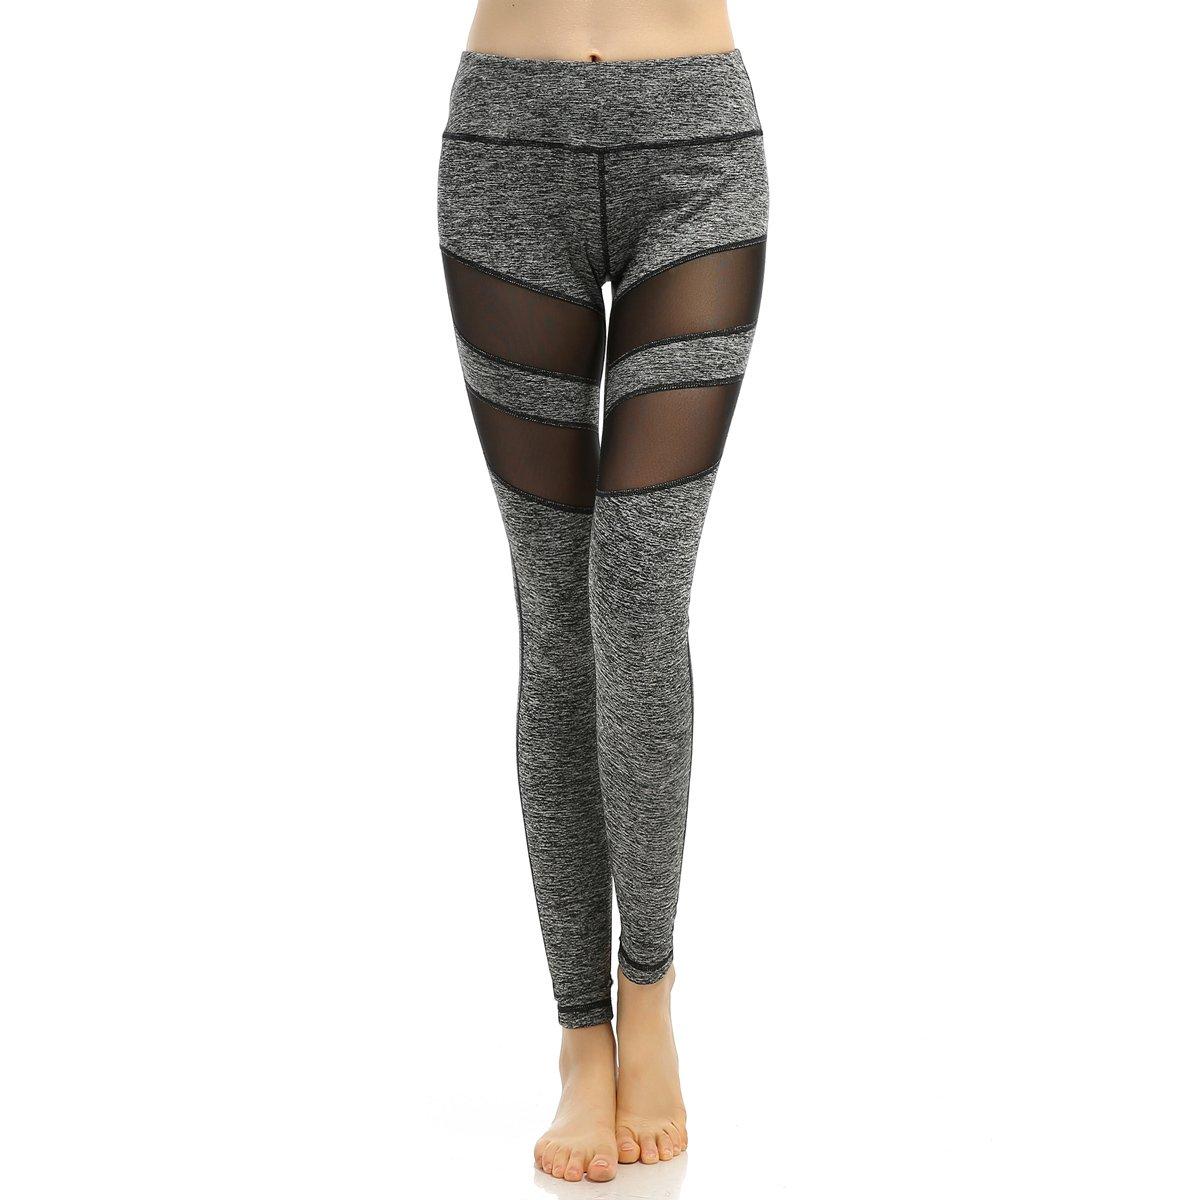 Chaiyan Frauen Sporthosen Yoga Leggings Workout Hose Laufhose Gym Leggings Neun Hosen